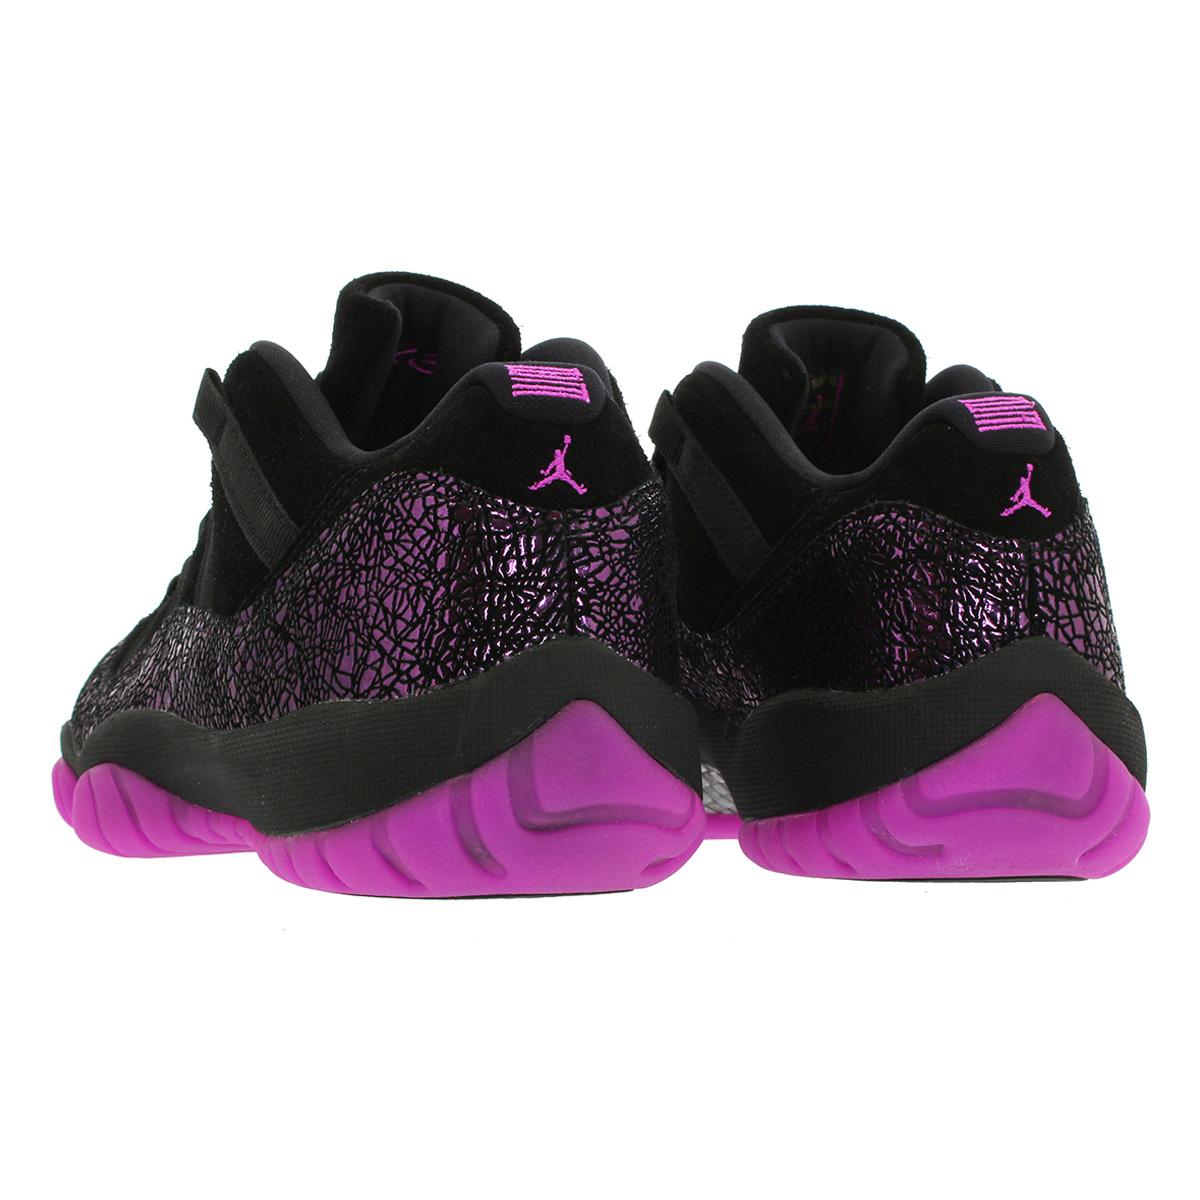 watch b2304 85e01 NIKE WMNS AIR JORDAN 11 RETRO LOW Nike women Air Jordan 11 nostalgic low  BLACK/FUCHSIA BLAST ar5149-005